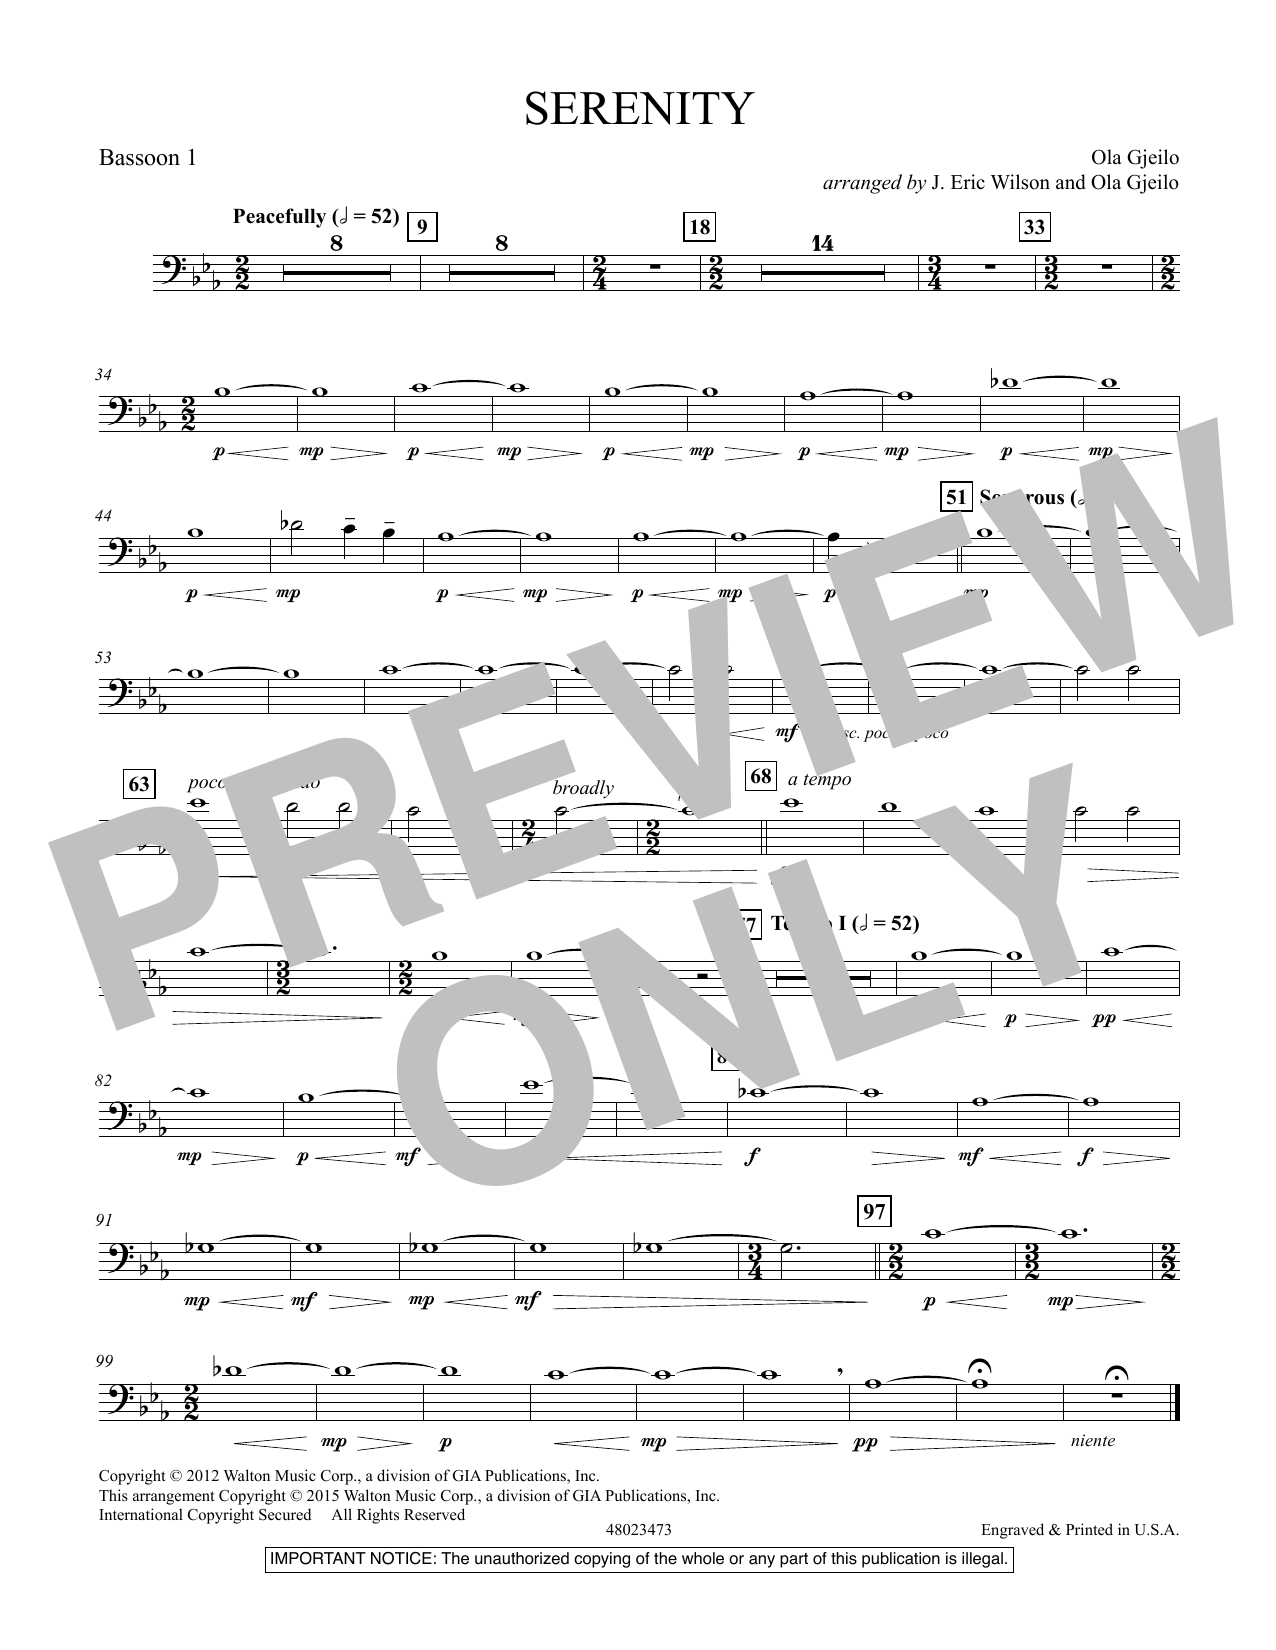 Serenity - Bassoon 1 (Concert Band)